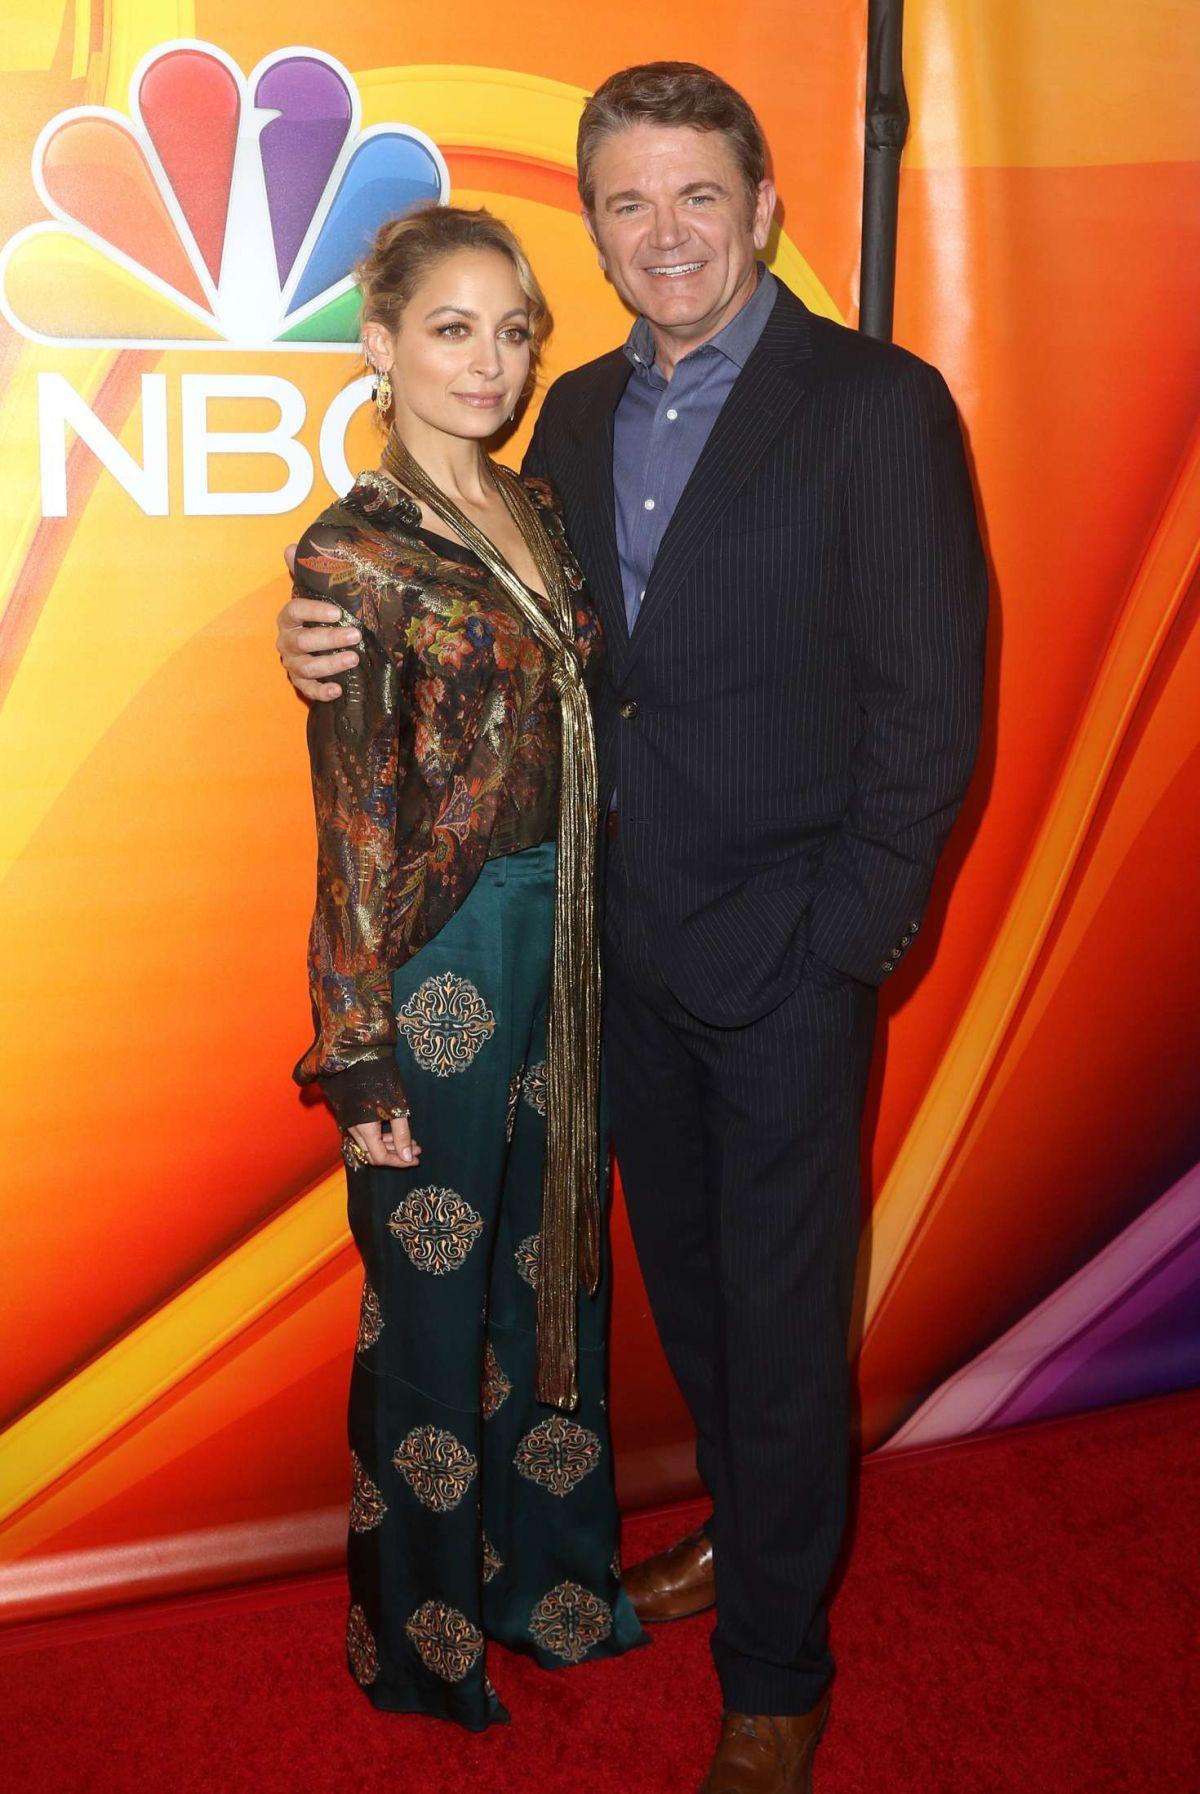 NICOLE RICHIE at NBC/U... Nicole Richie Split